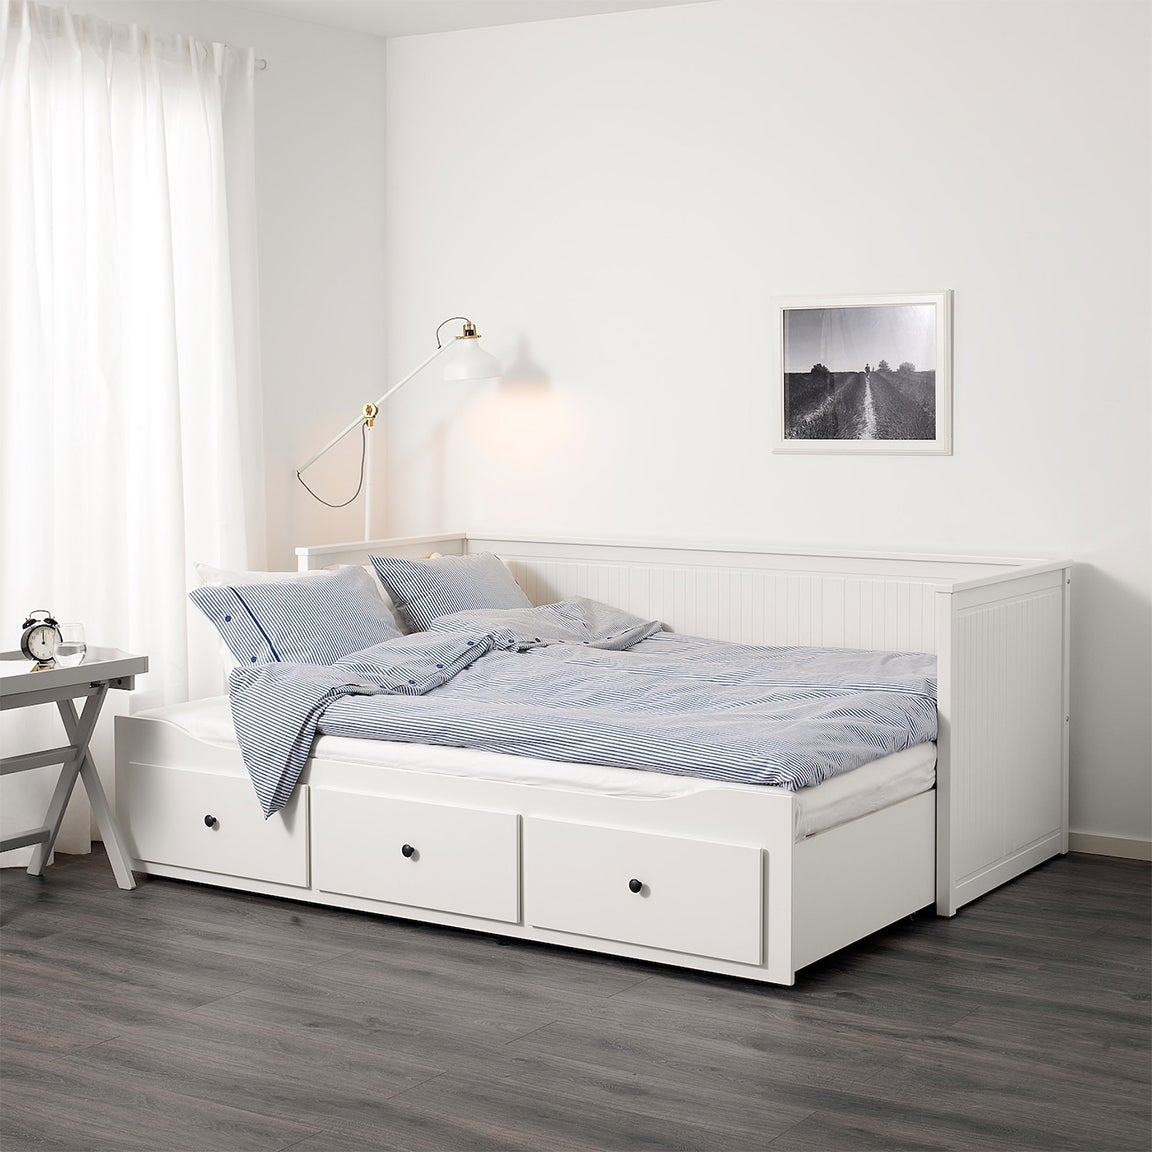 ikea-small-bedroom-furniture-domino-hemnes